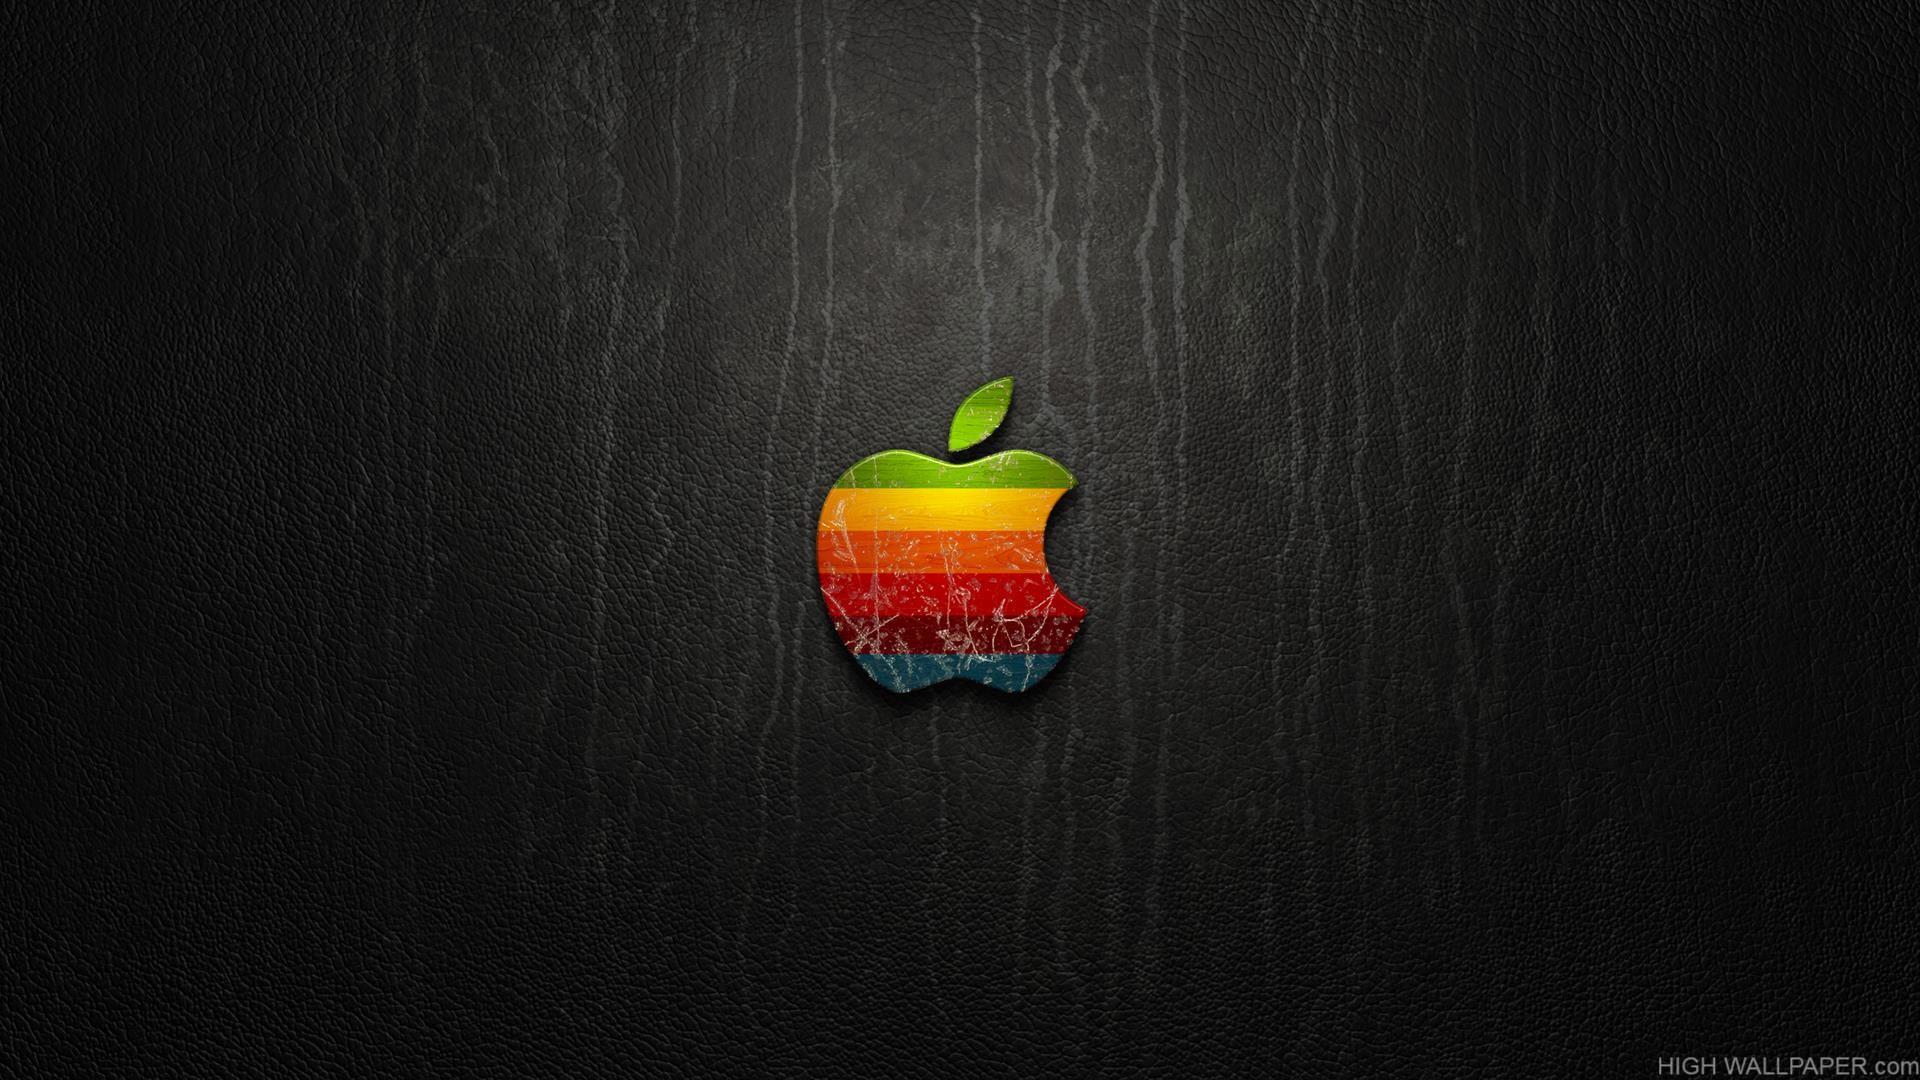 Coloful Apple Logo On Black Background